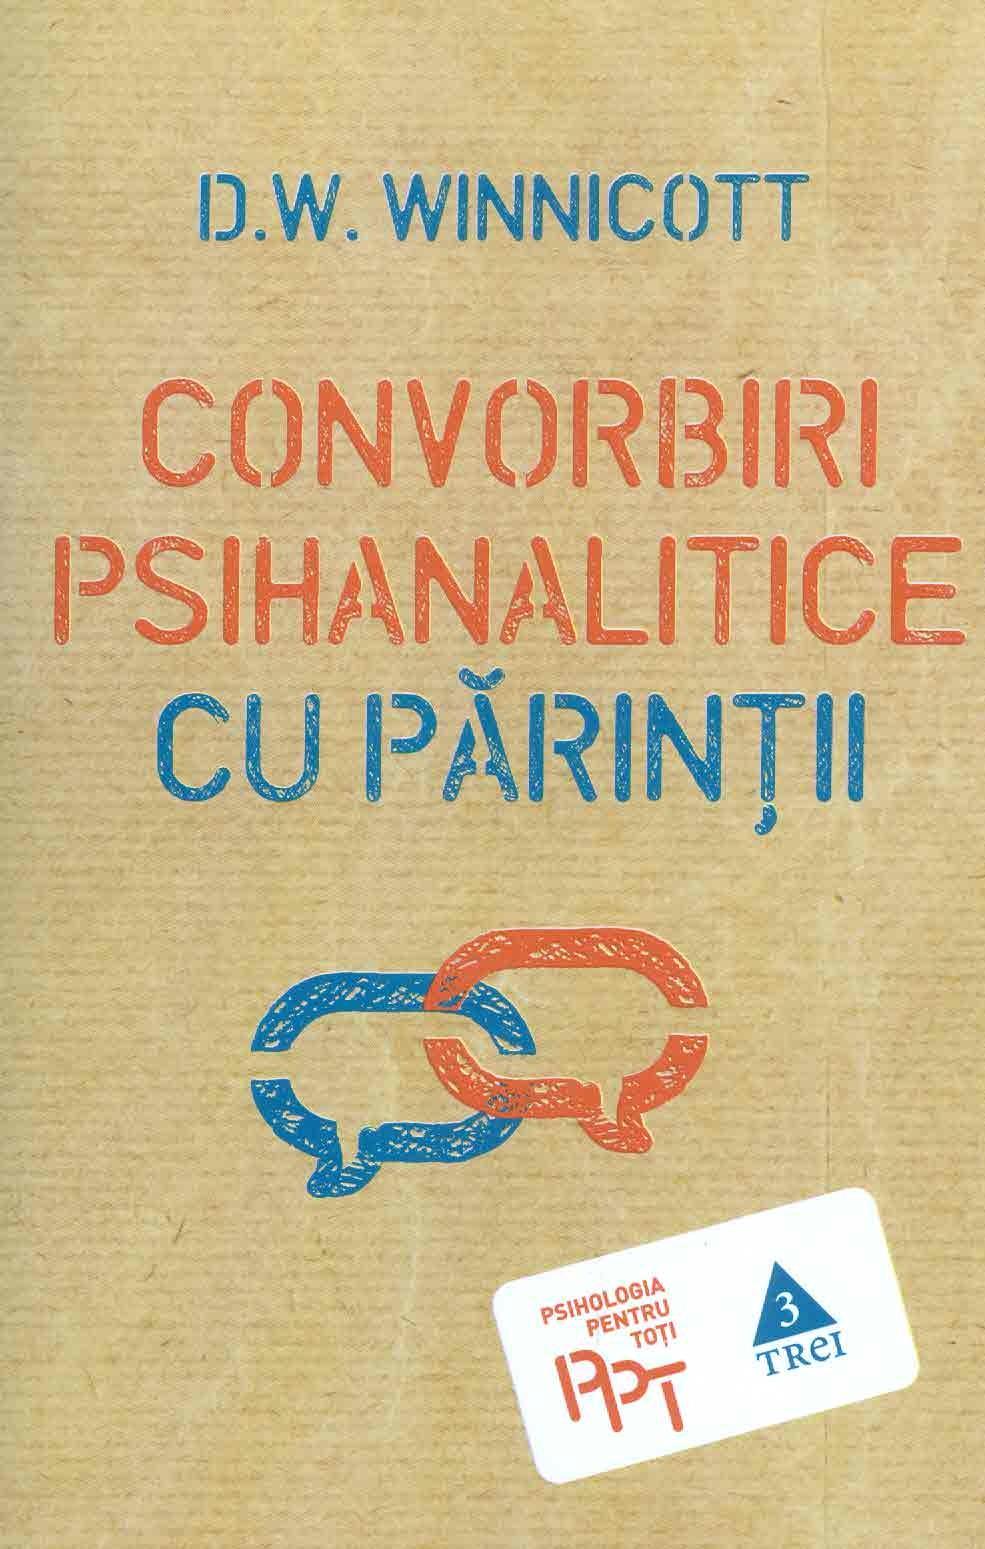 D-W-Winnicott__Convorbiri-psihanalitice-cu-parintii